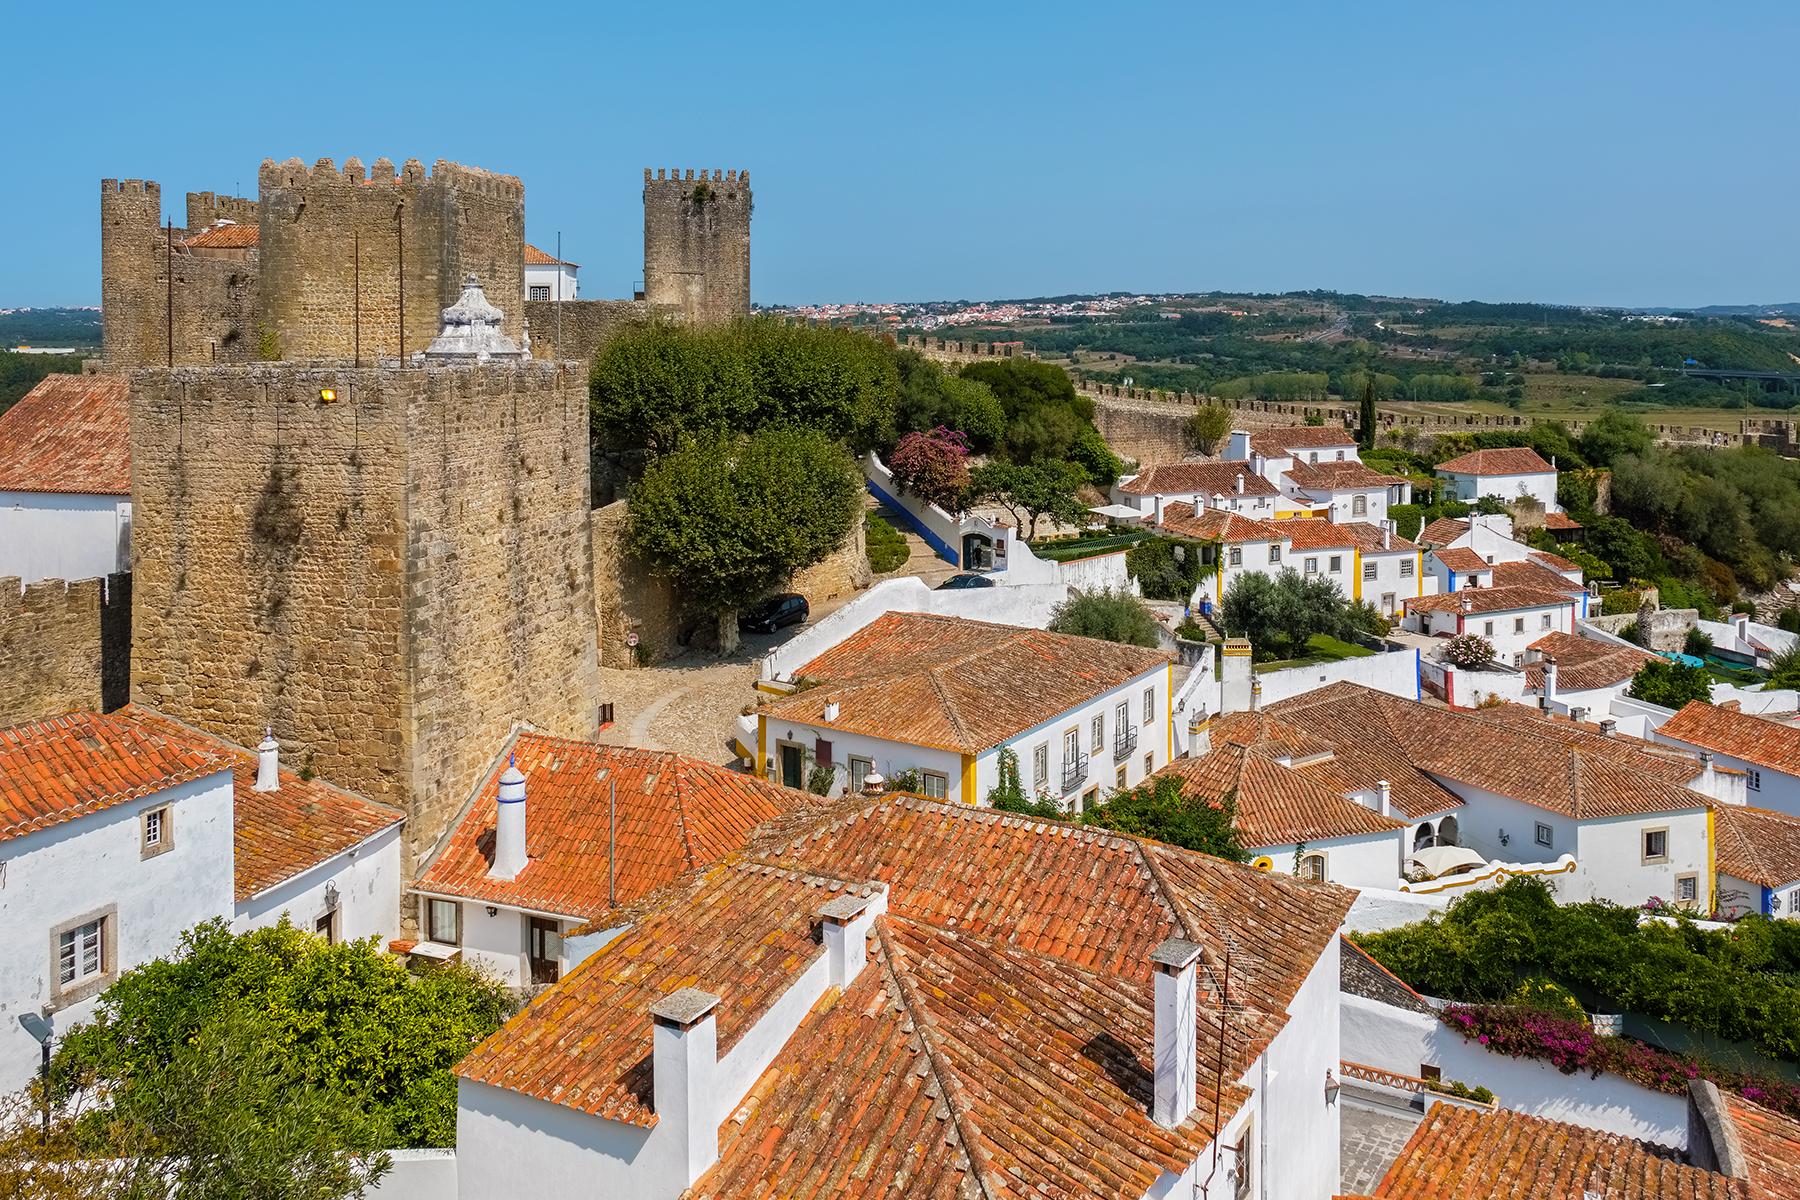 portugal_obidos_bigstock--212548387_resize.jpg